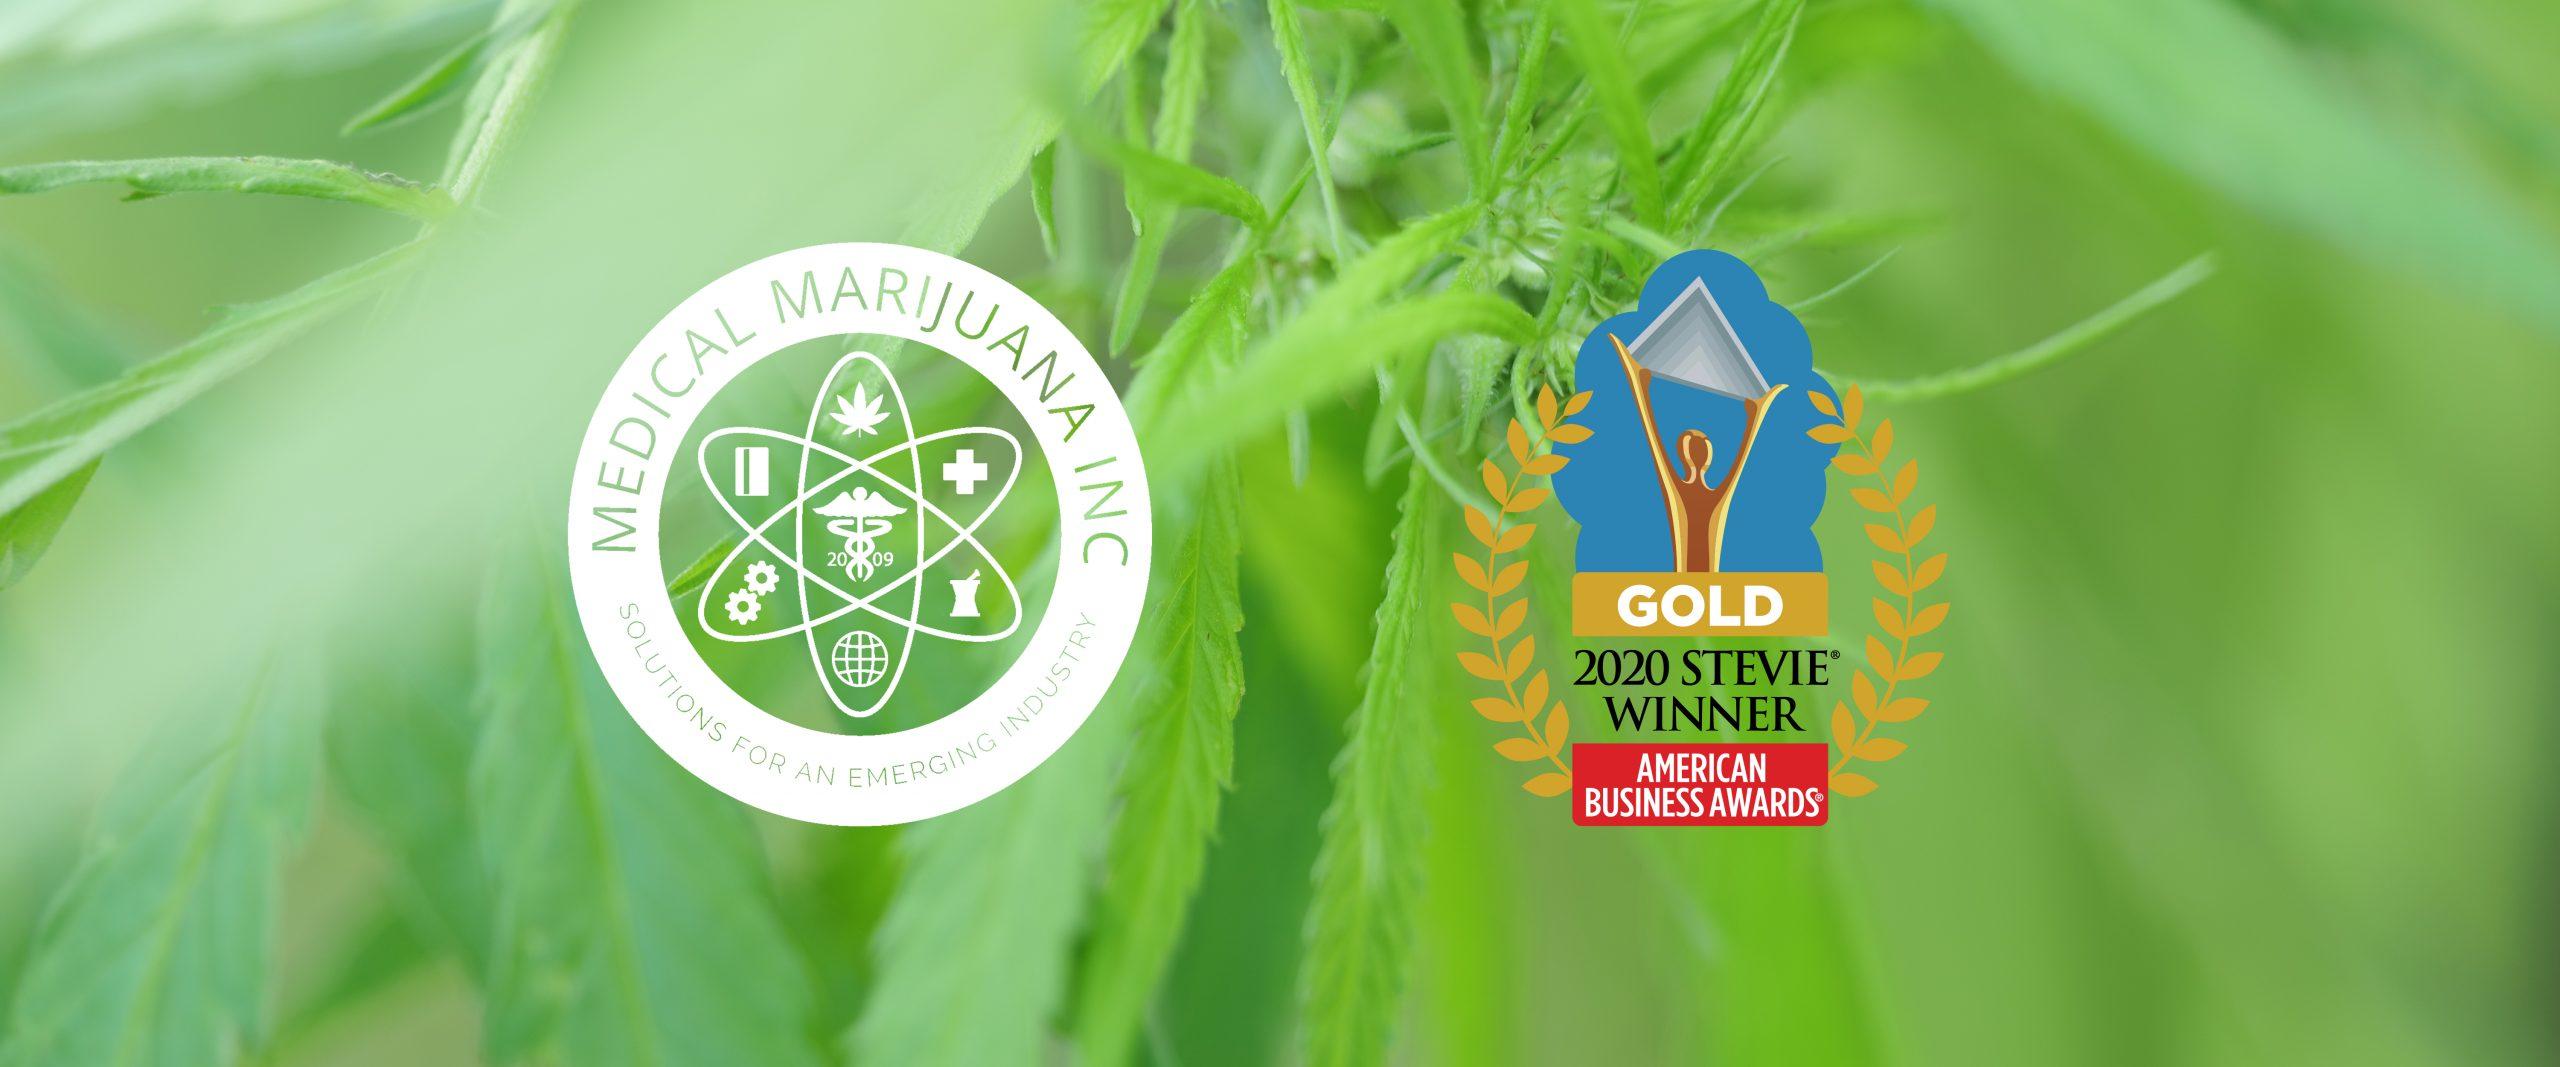 Medical Marijuana, Inc. and Its Subsidiaries Recognized with Prestigious Stevie® Awards